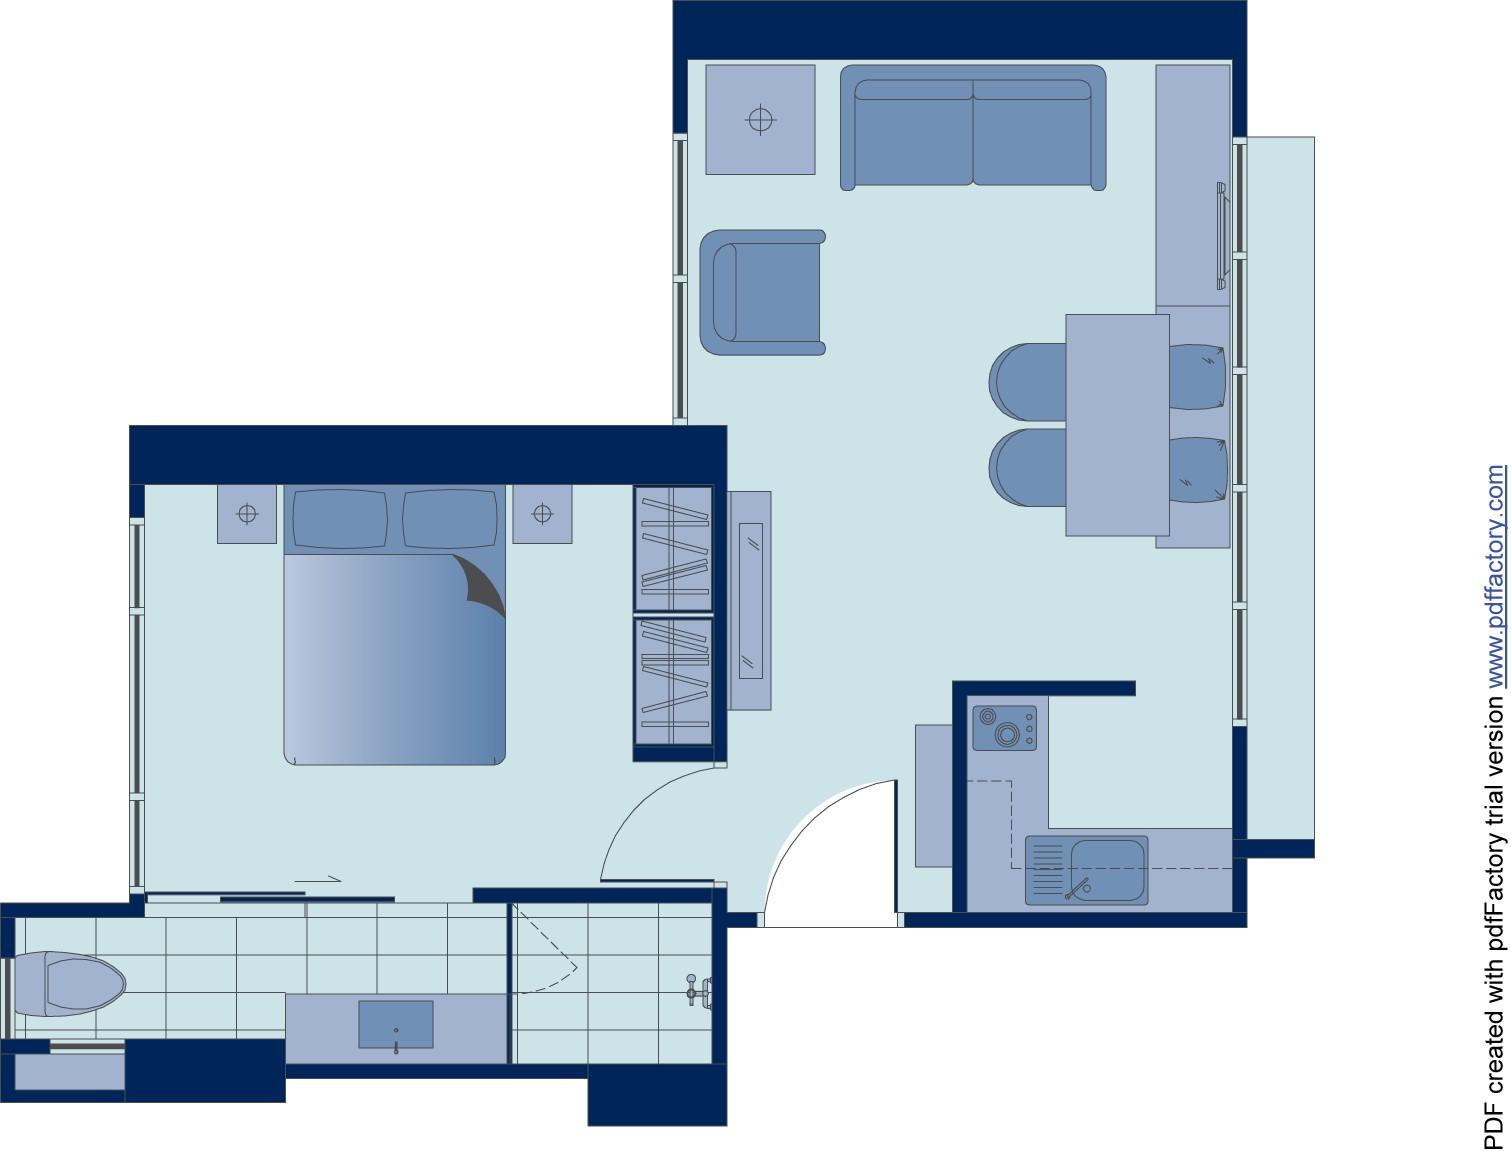 Floor plan 6 at Peel Street Central Apartments